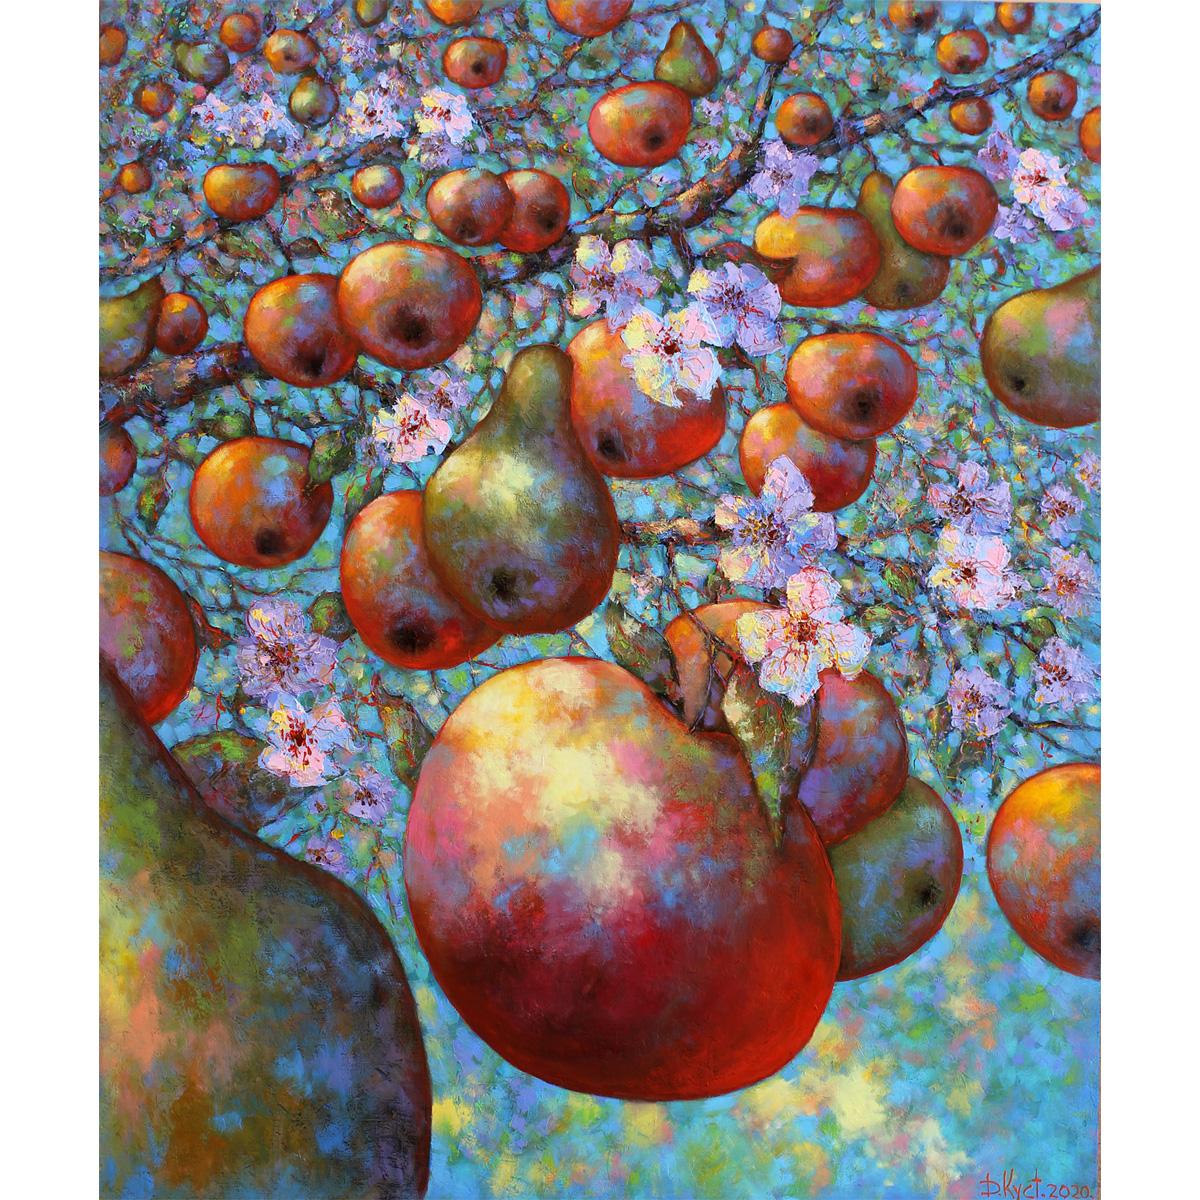 Urban фреска (жикле) по картине Дмитрия Кустановича «Сад Радости»